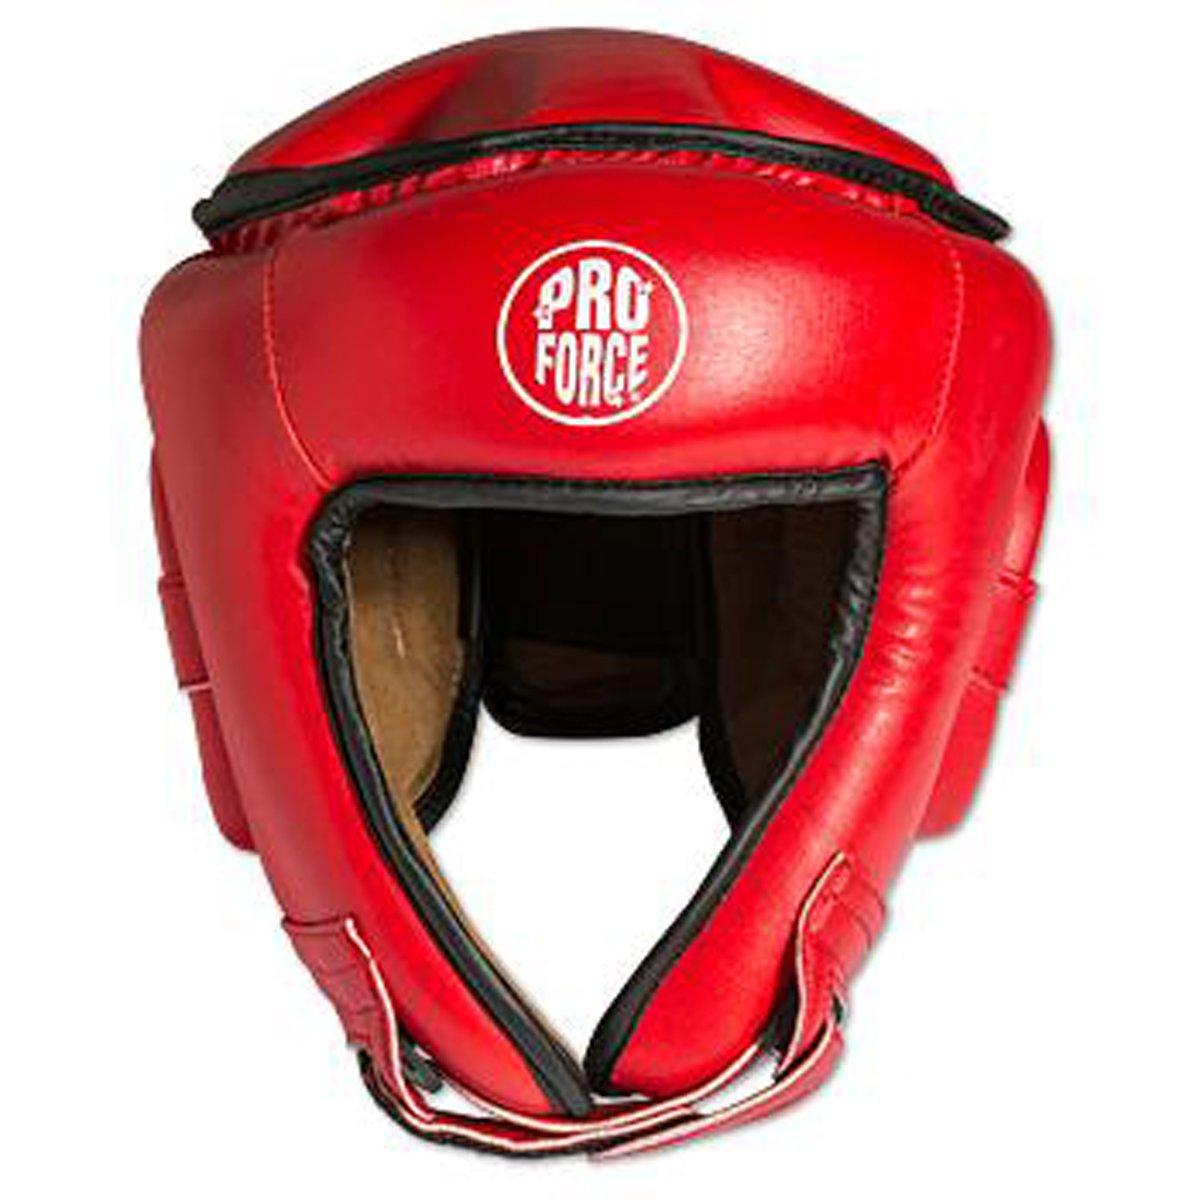 Gungfu Proforce レッド Open Face Face Headgear – B01DD0IIAC レッド Large B01DD0IIAC, 和歌山県有田市:b95253ae --- capela.dominiotemporario.com